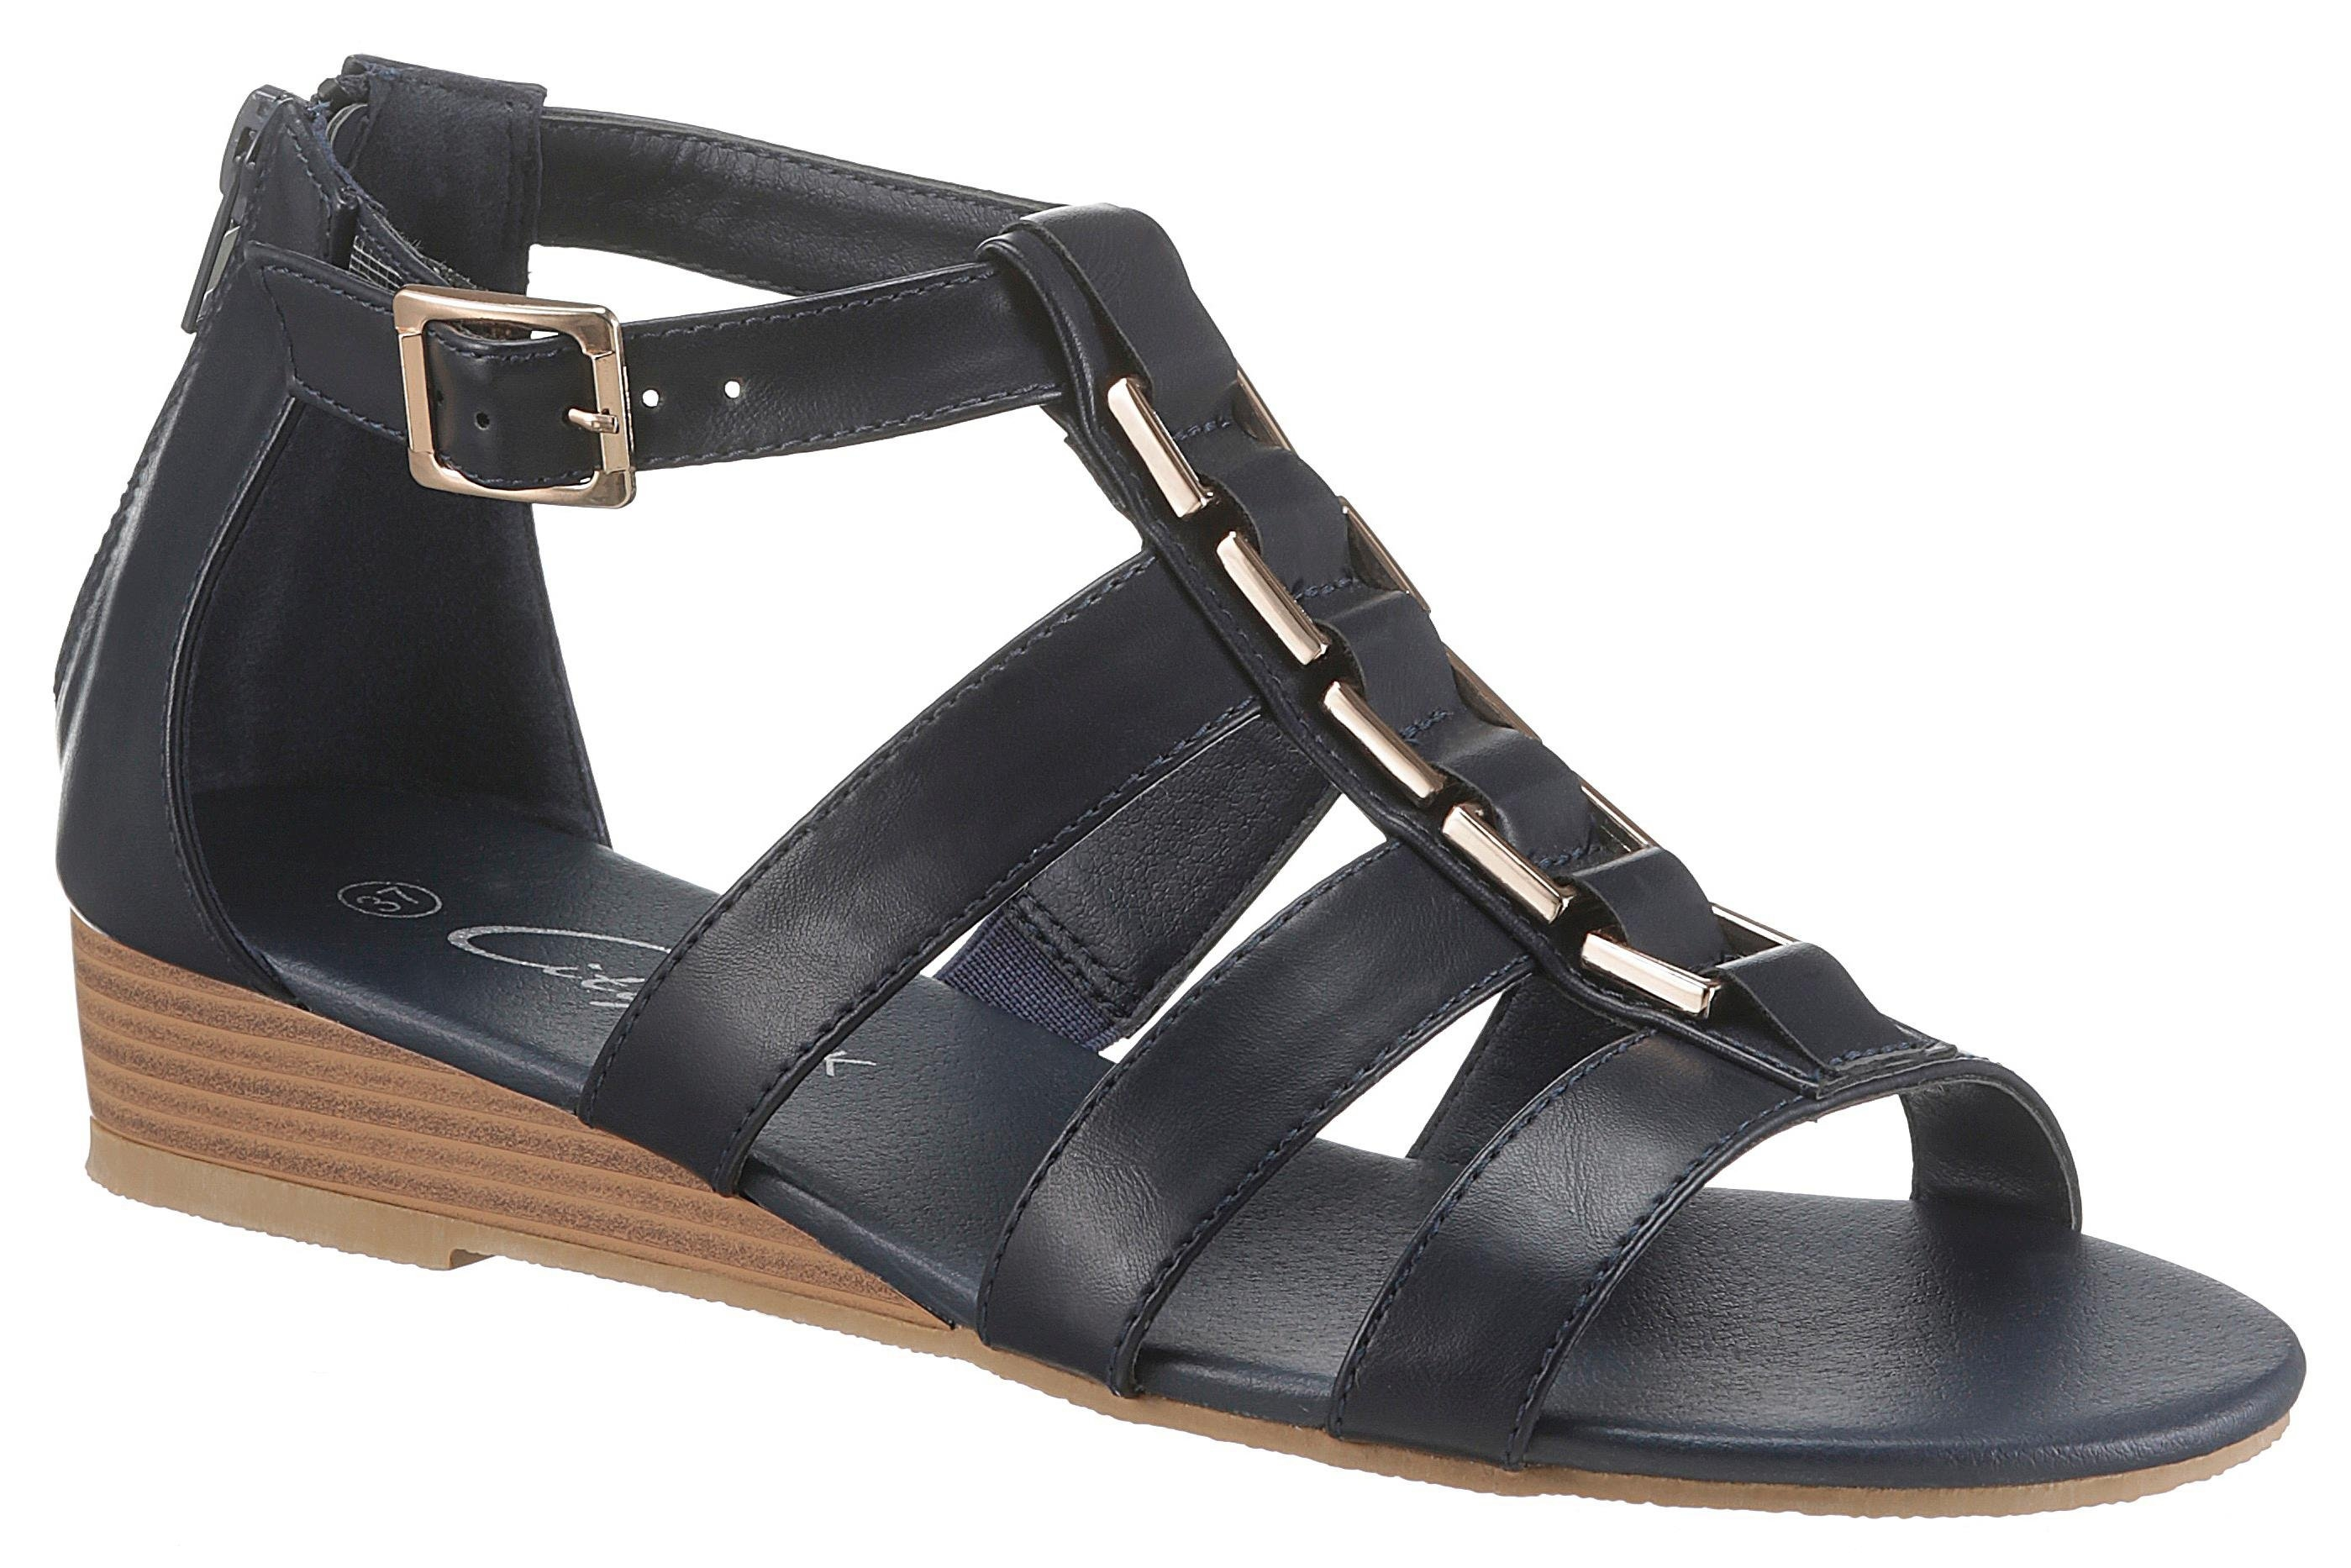 CITY WALK Romeinse sandalen nu online bestellen